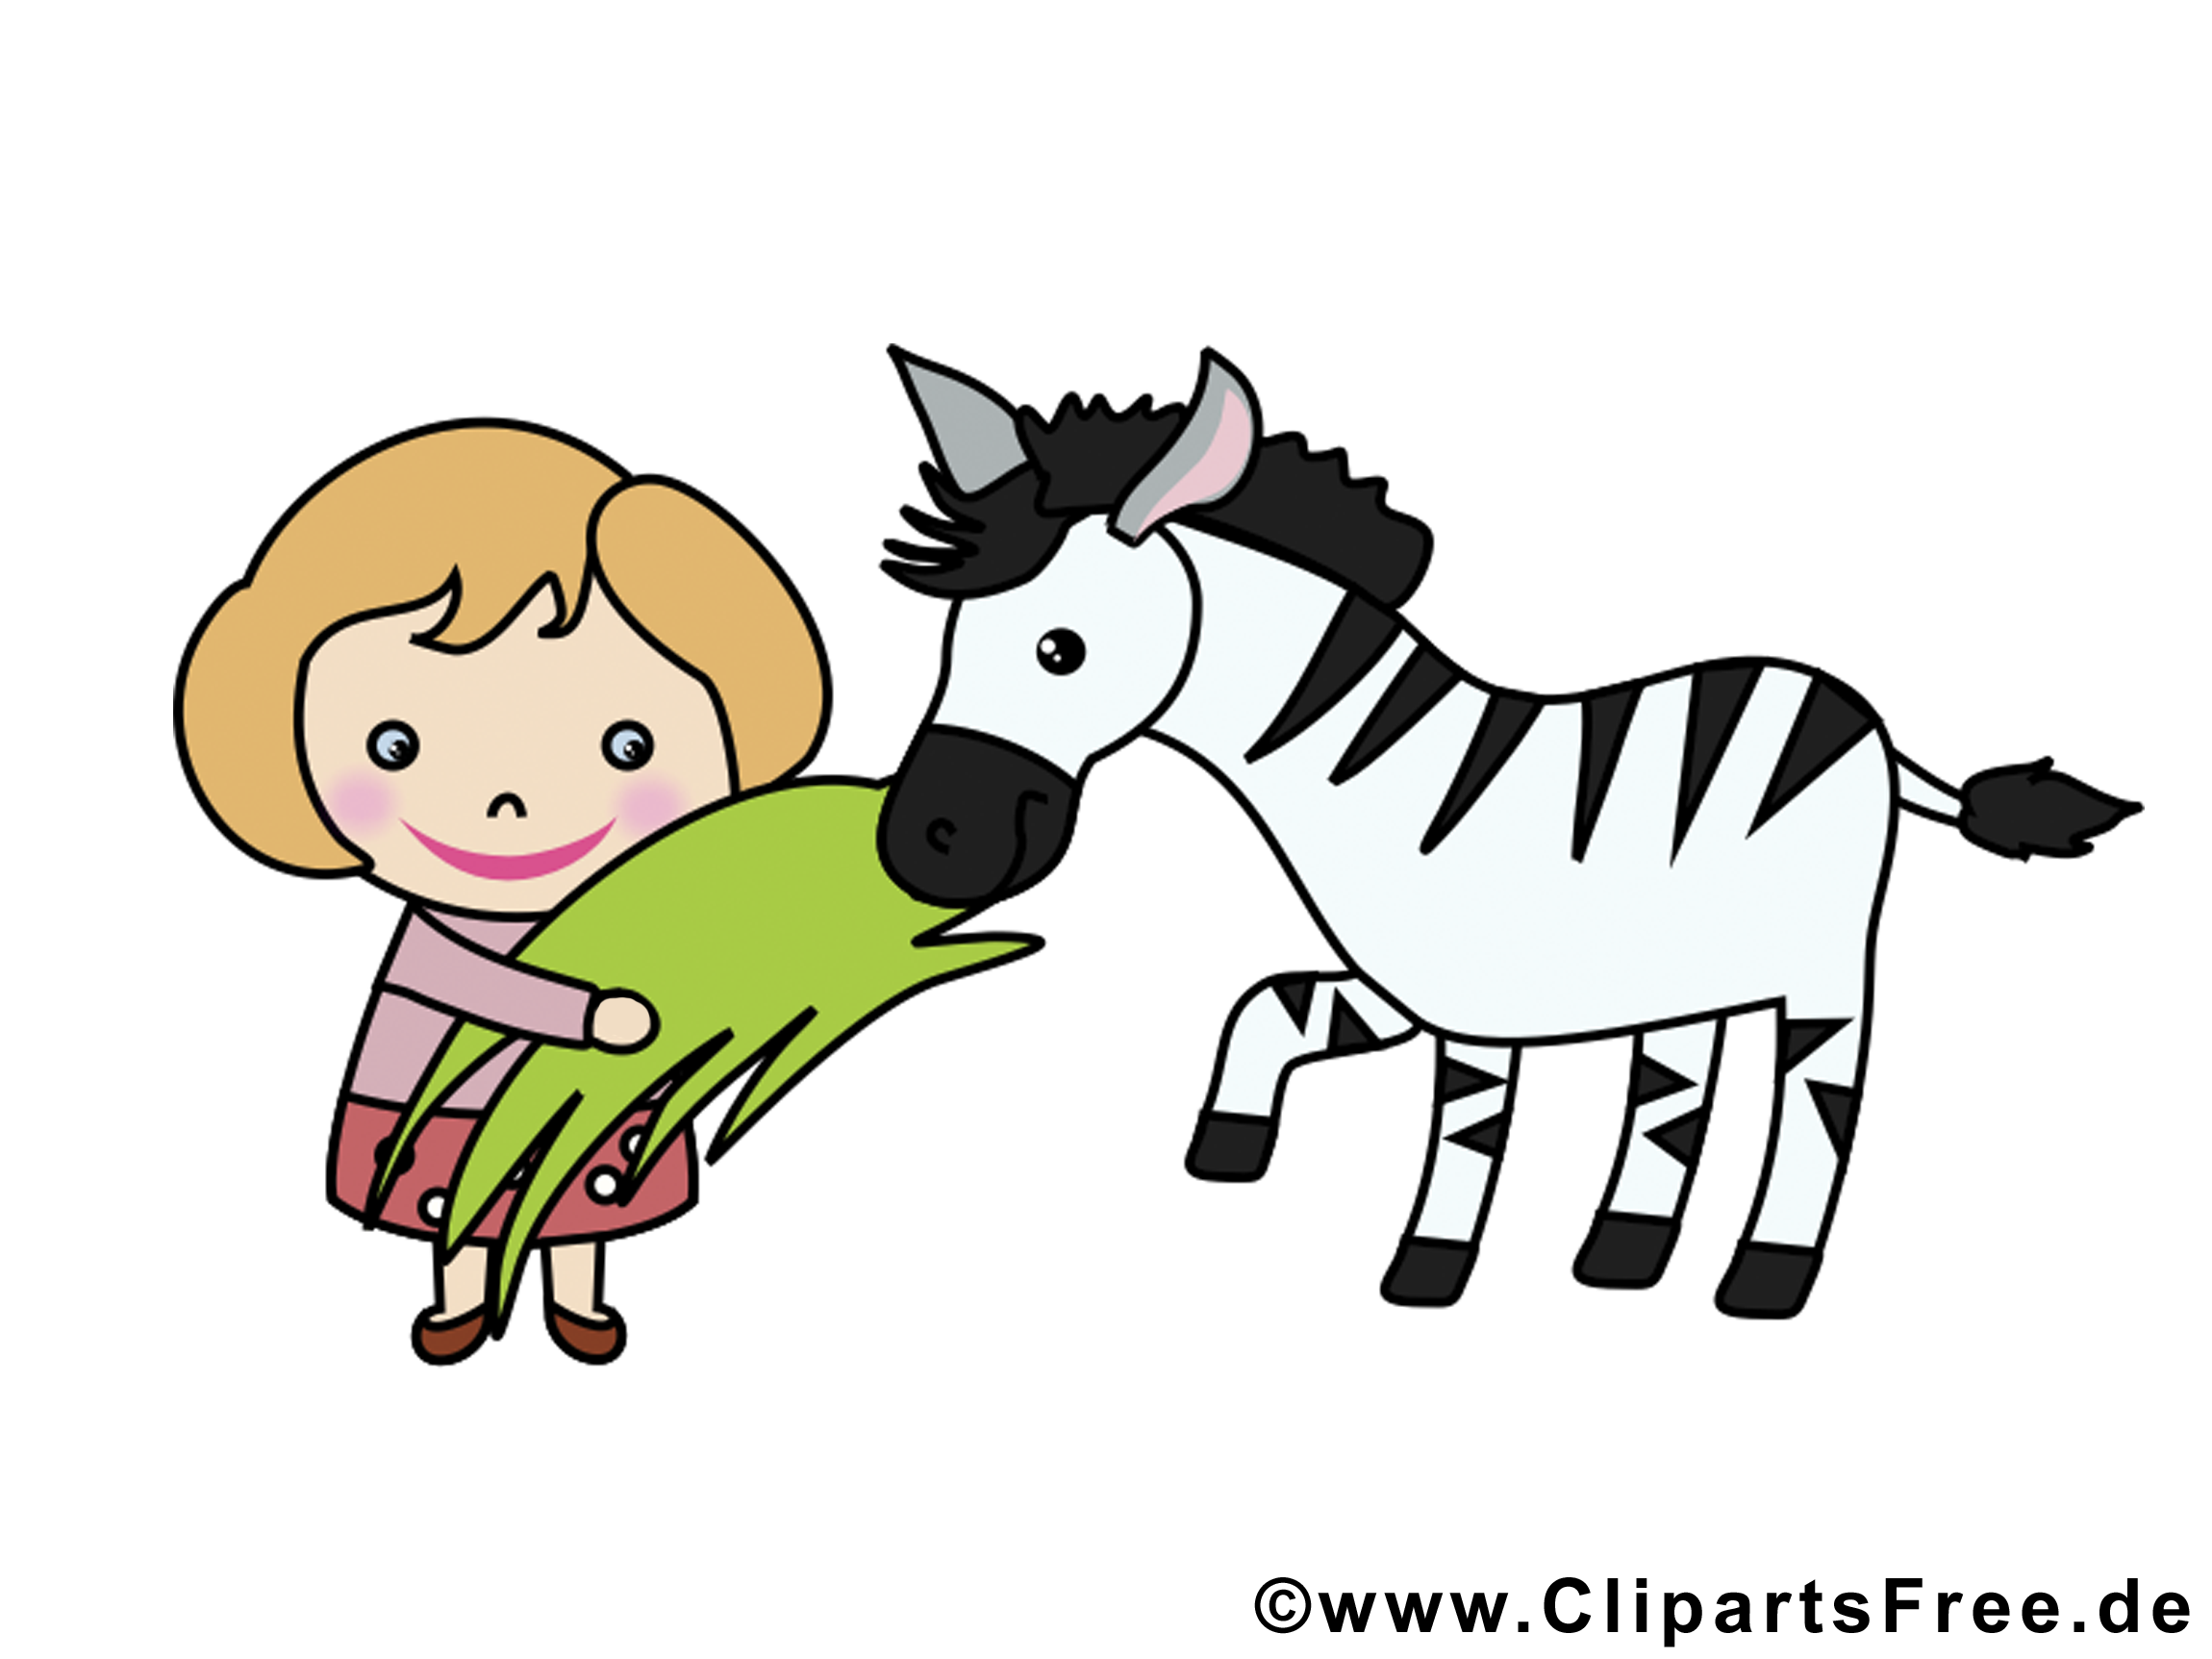 Fille zèbre dessin gratuit – Animal image